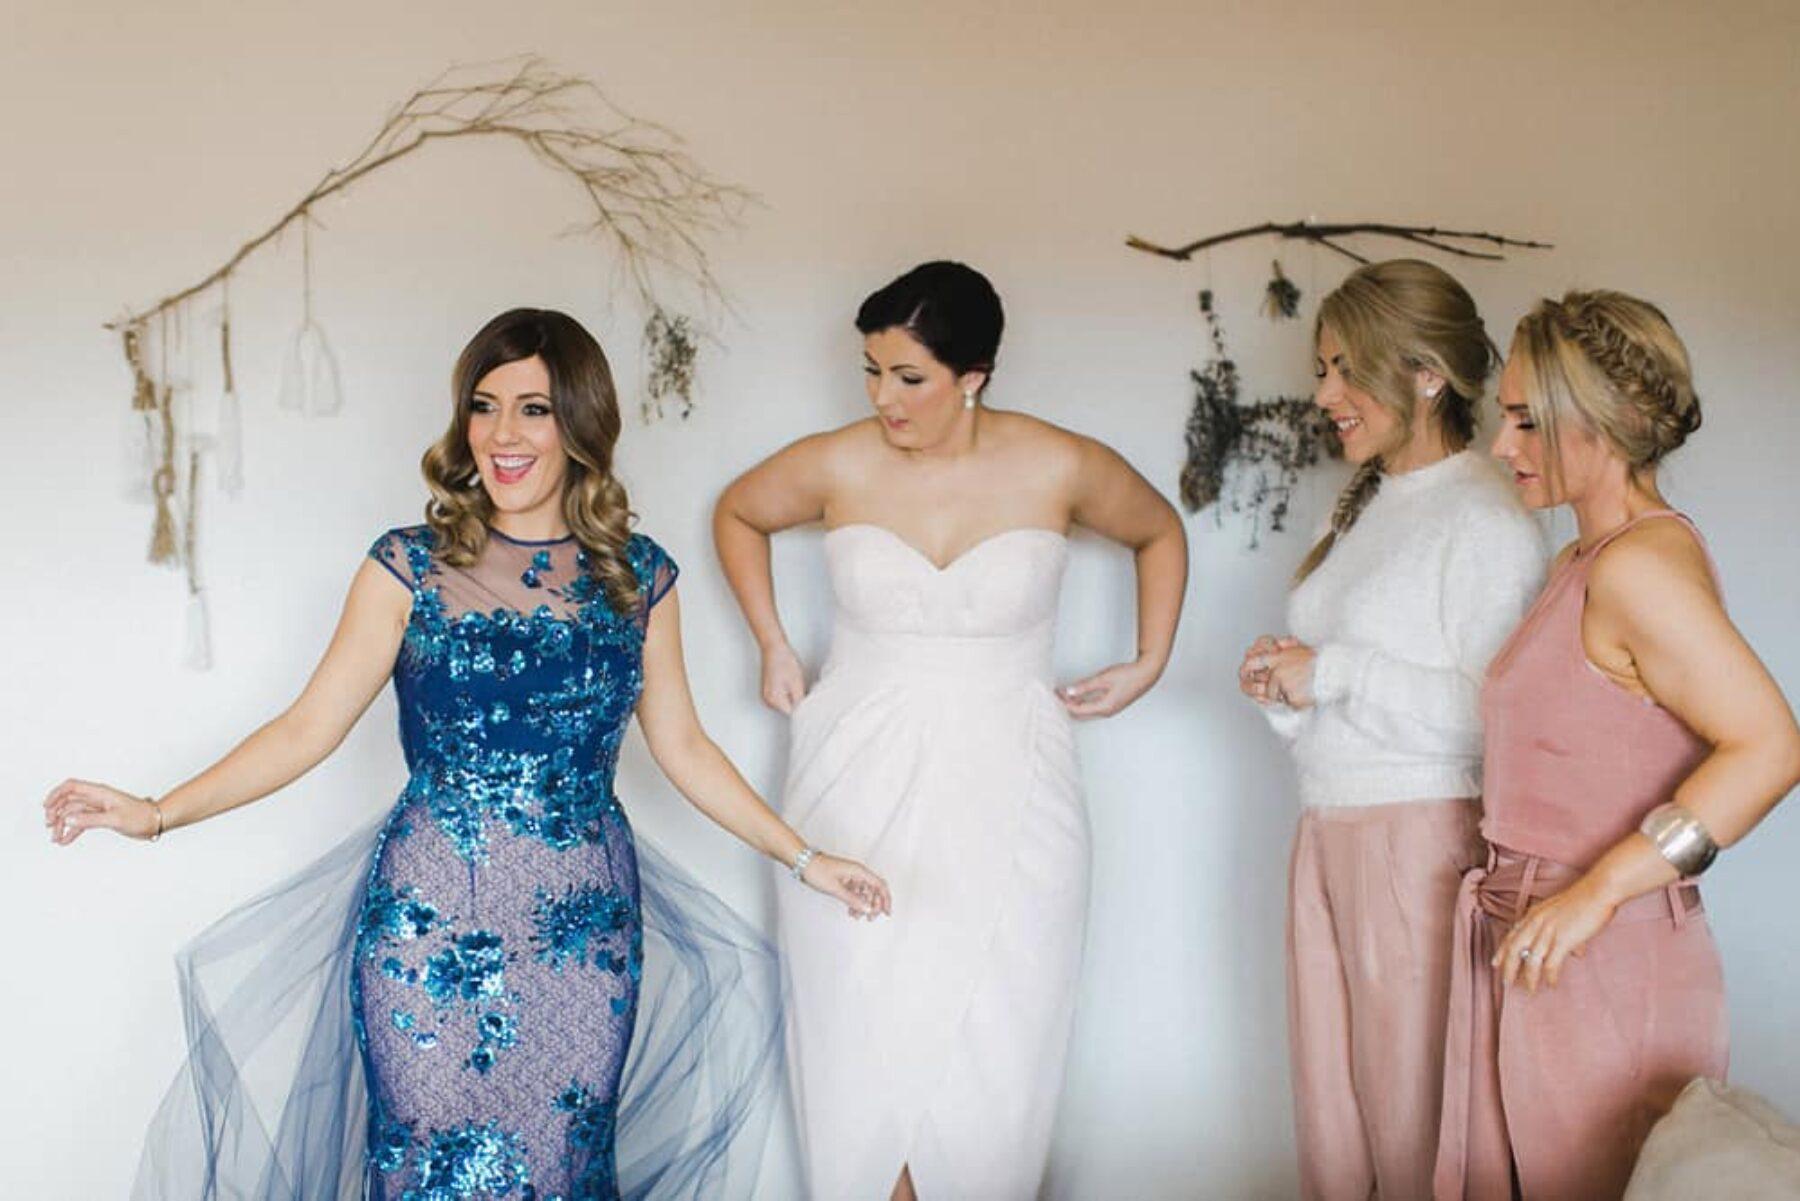 glenbernie-orchard-wedding-sydney-photographer-john-benavente 12